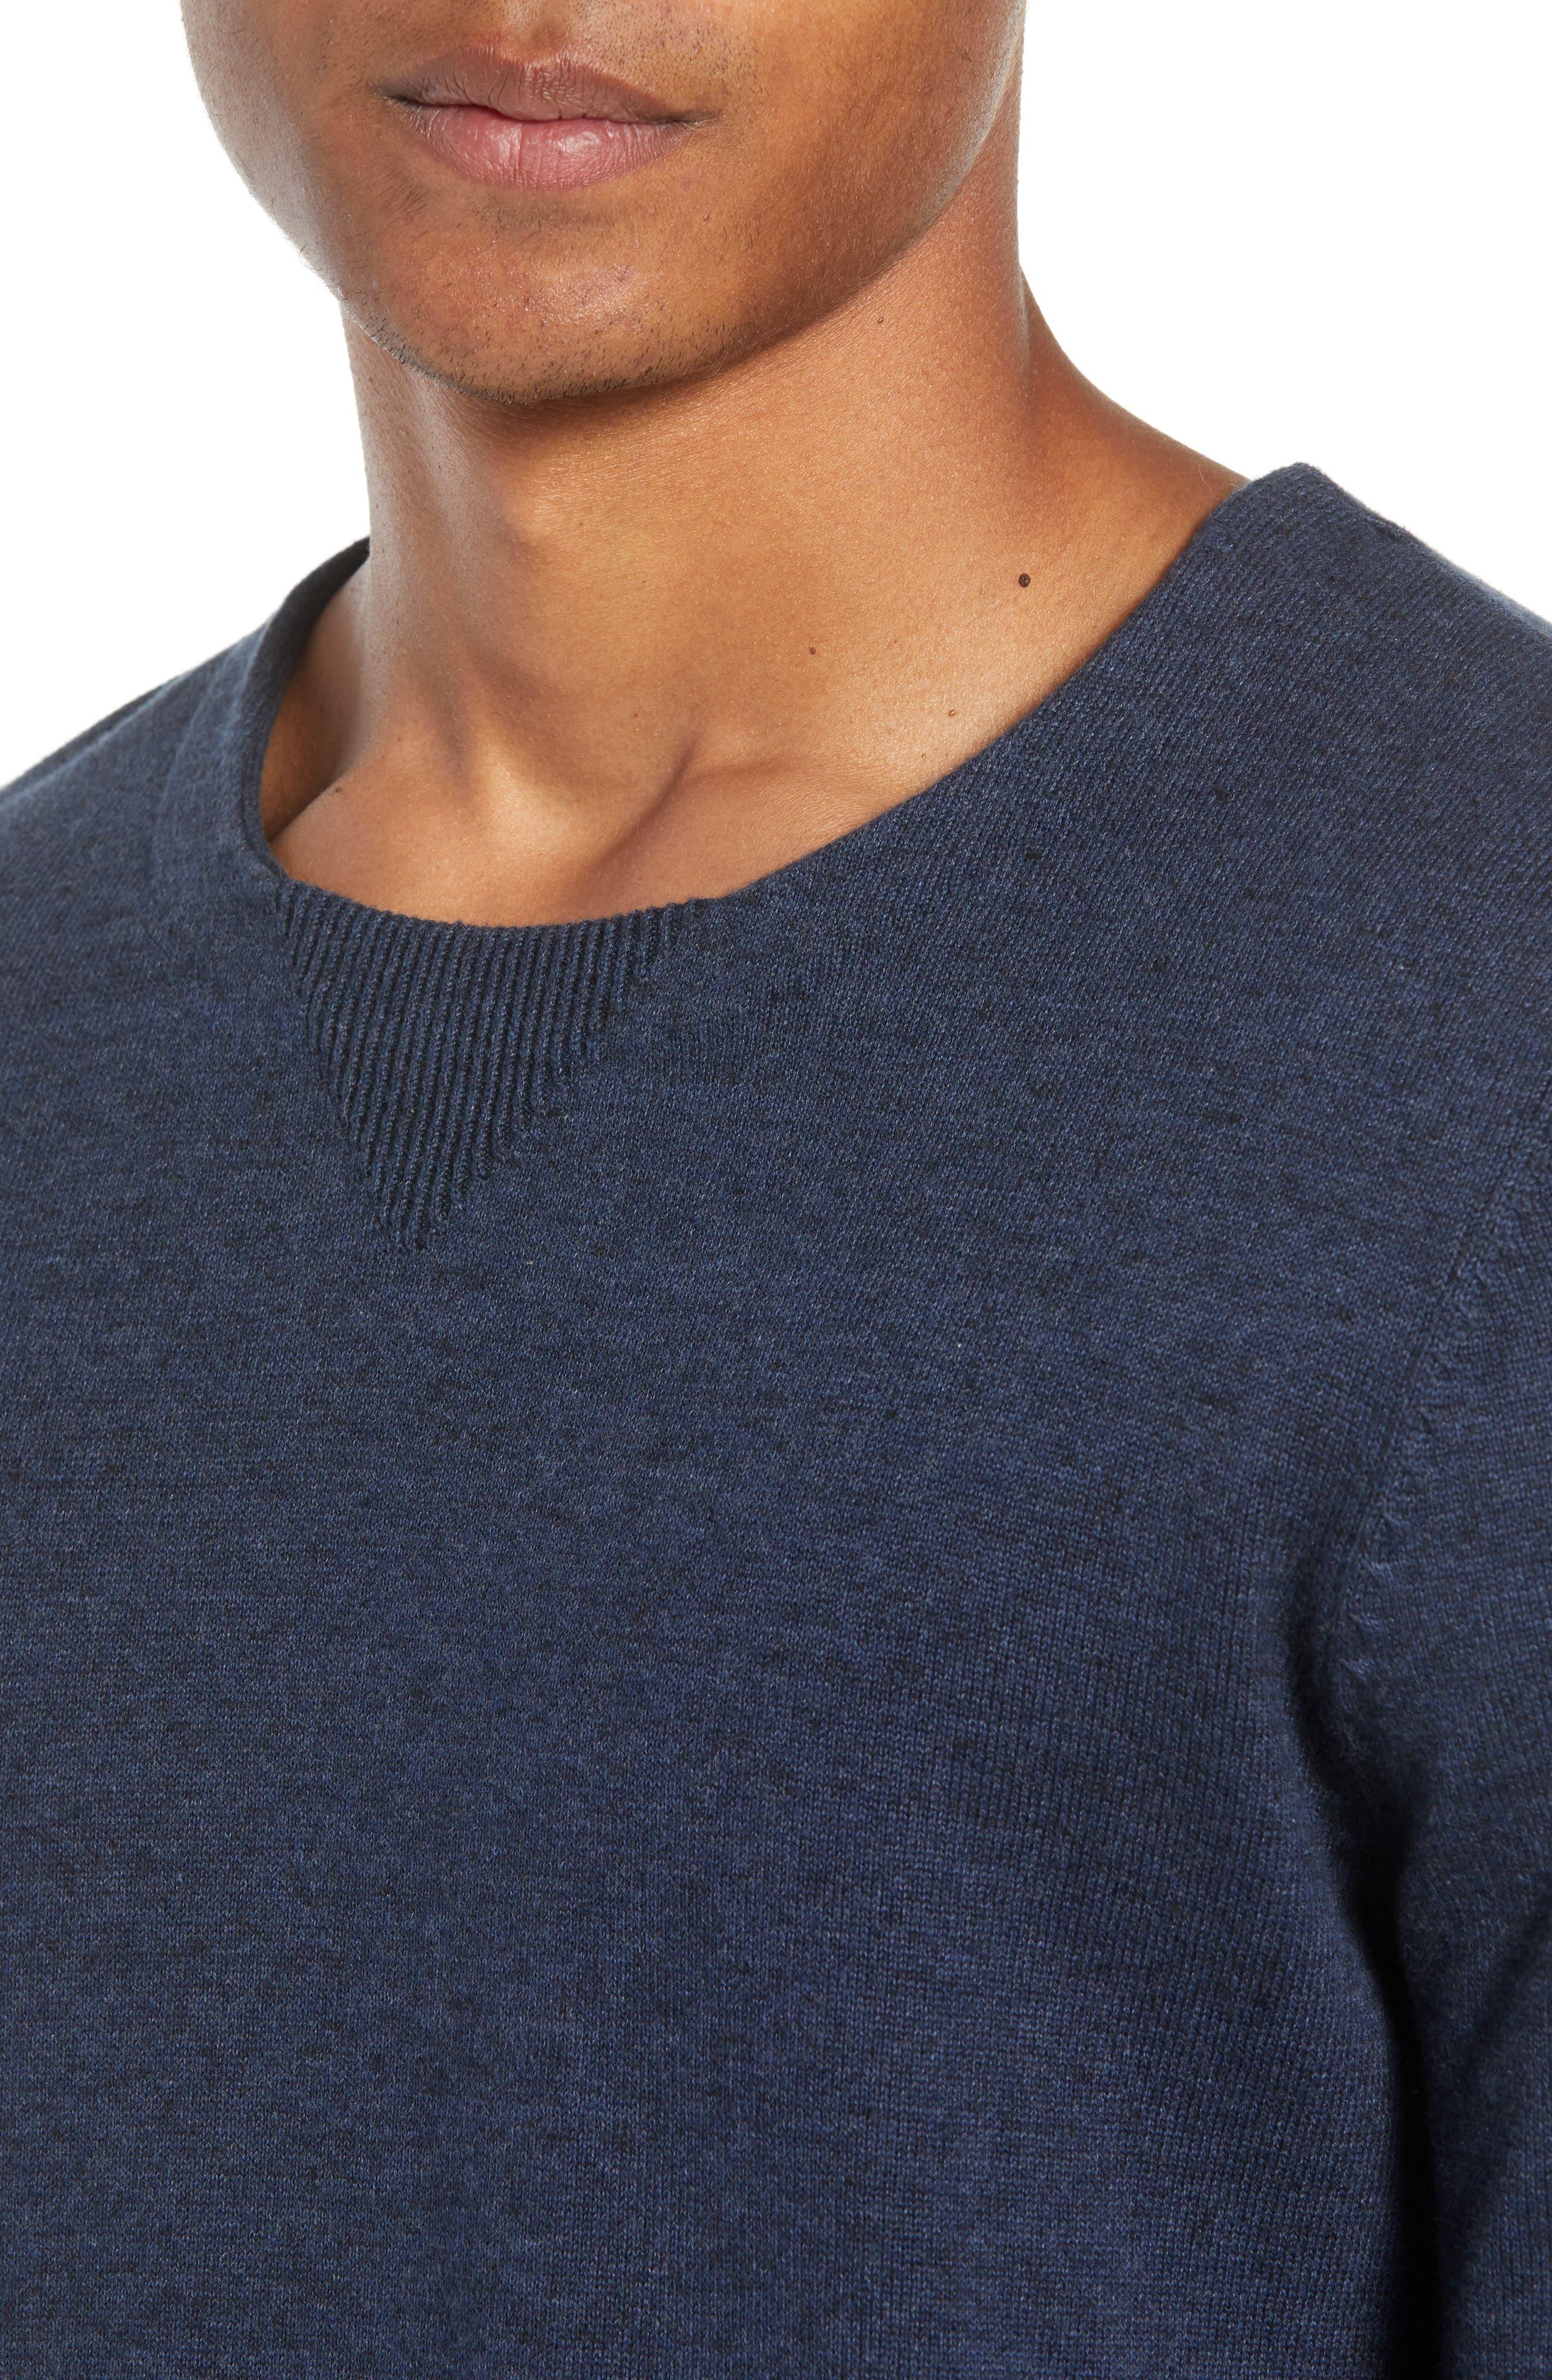 McGill Slim Fit Crewneck Sweater,                             Alternate thumbnail 4, color,                             HEATHER NAVY